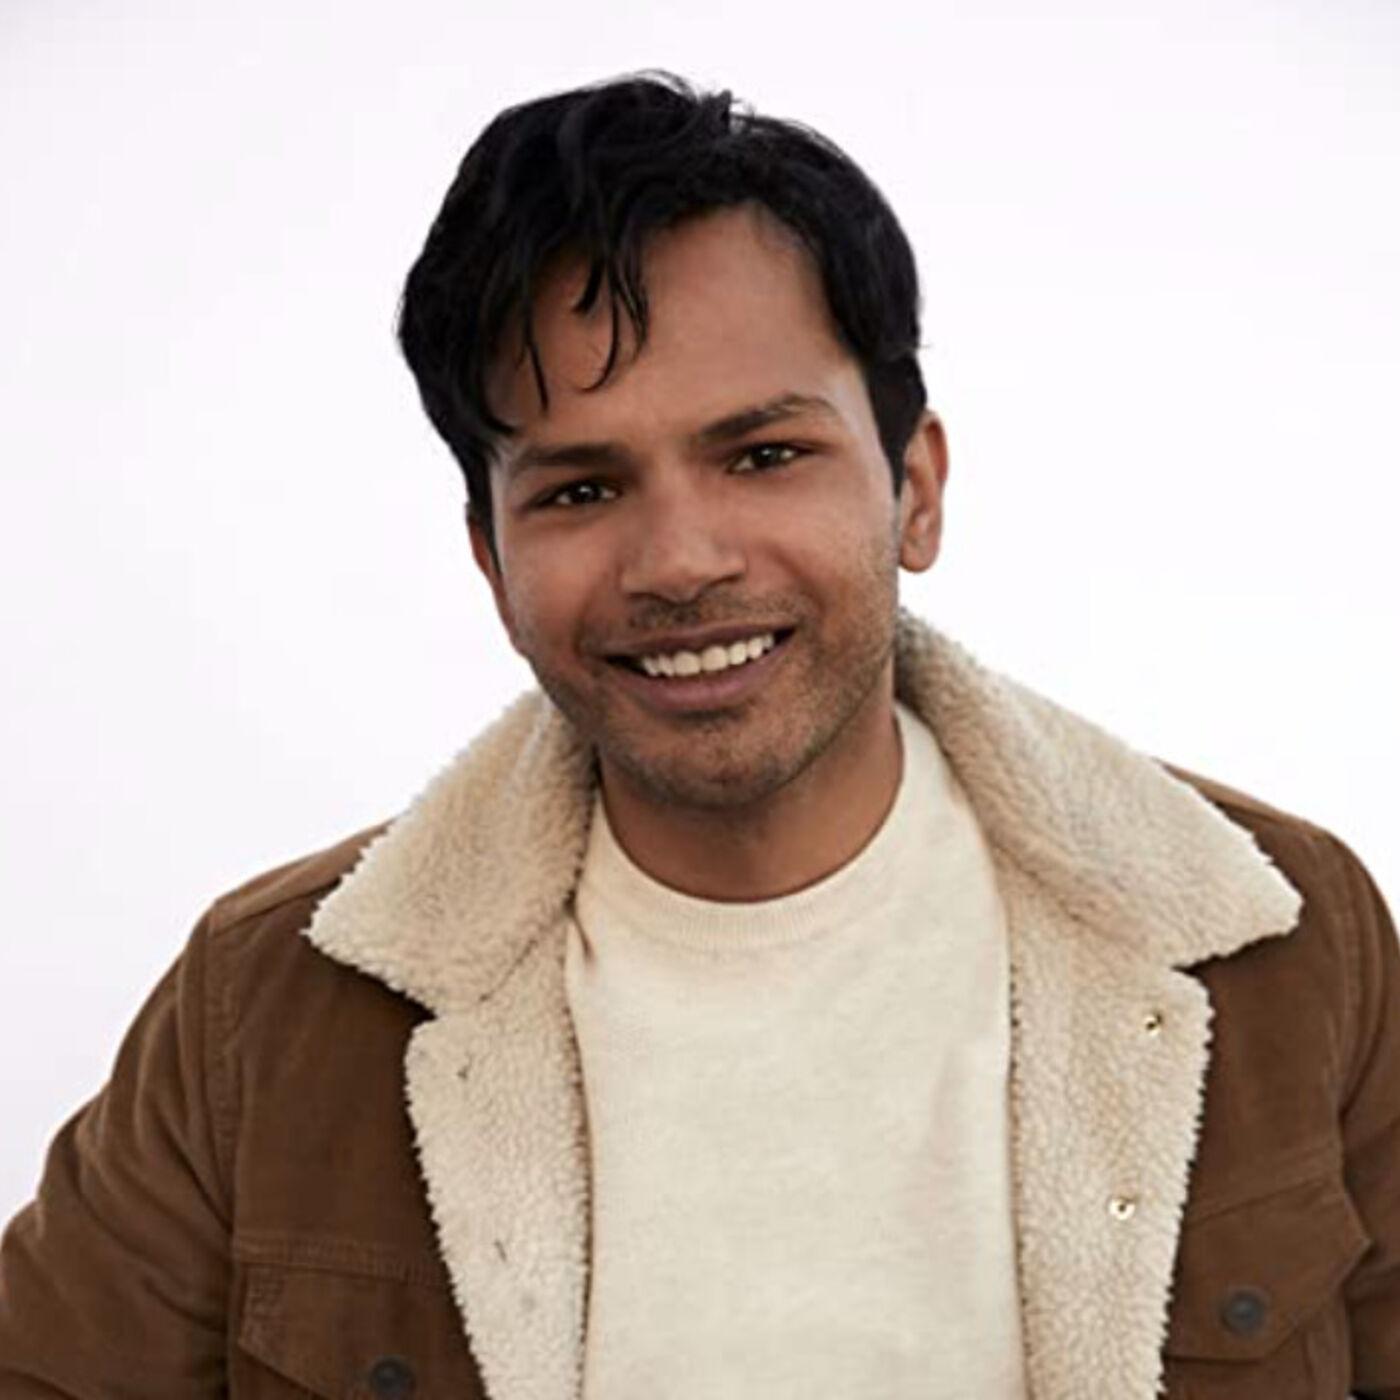 Actor/Director Jonah Aimz